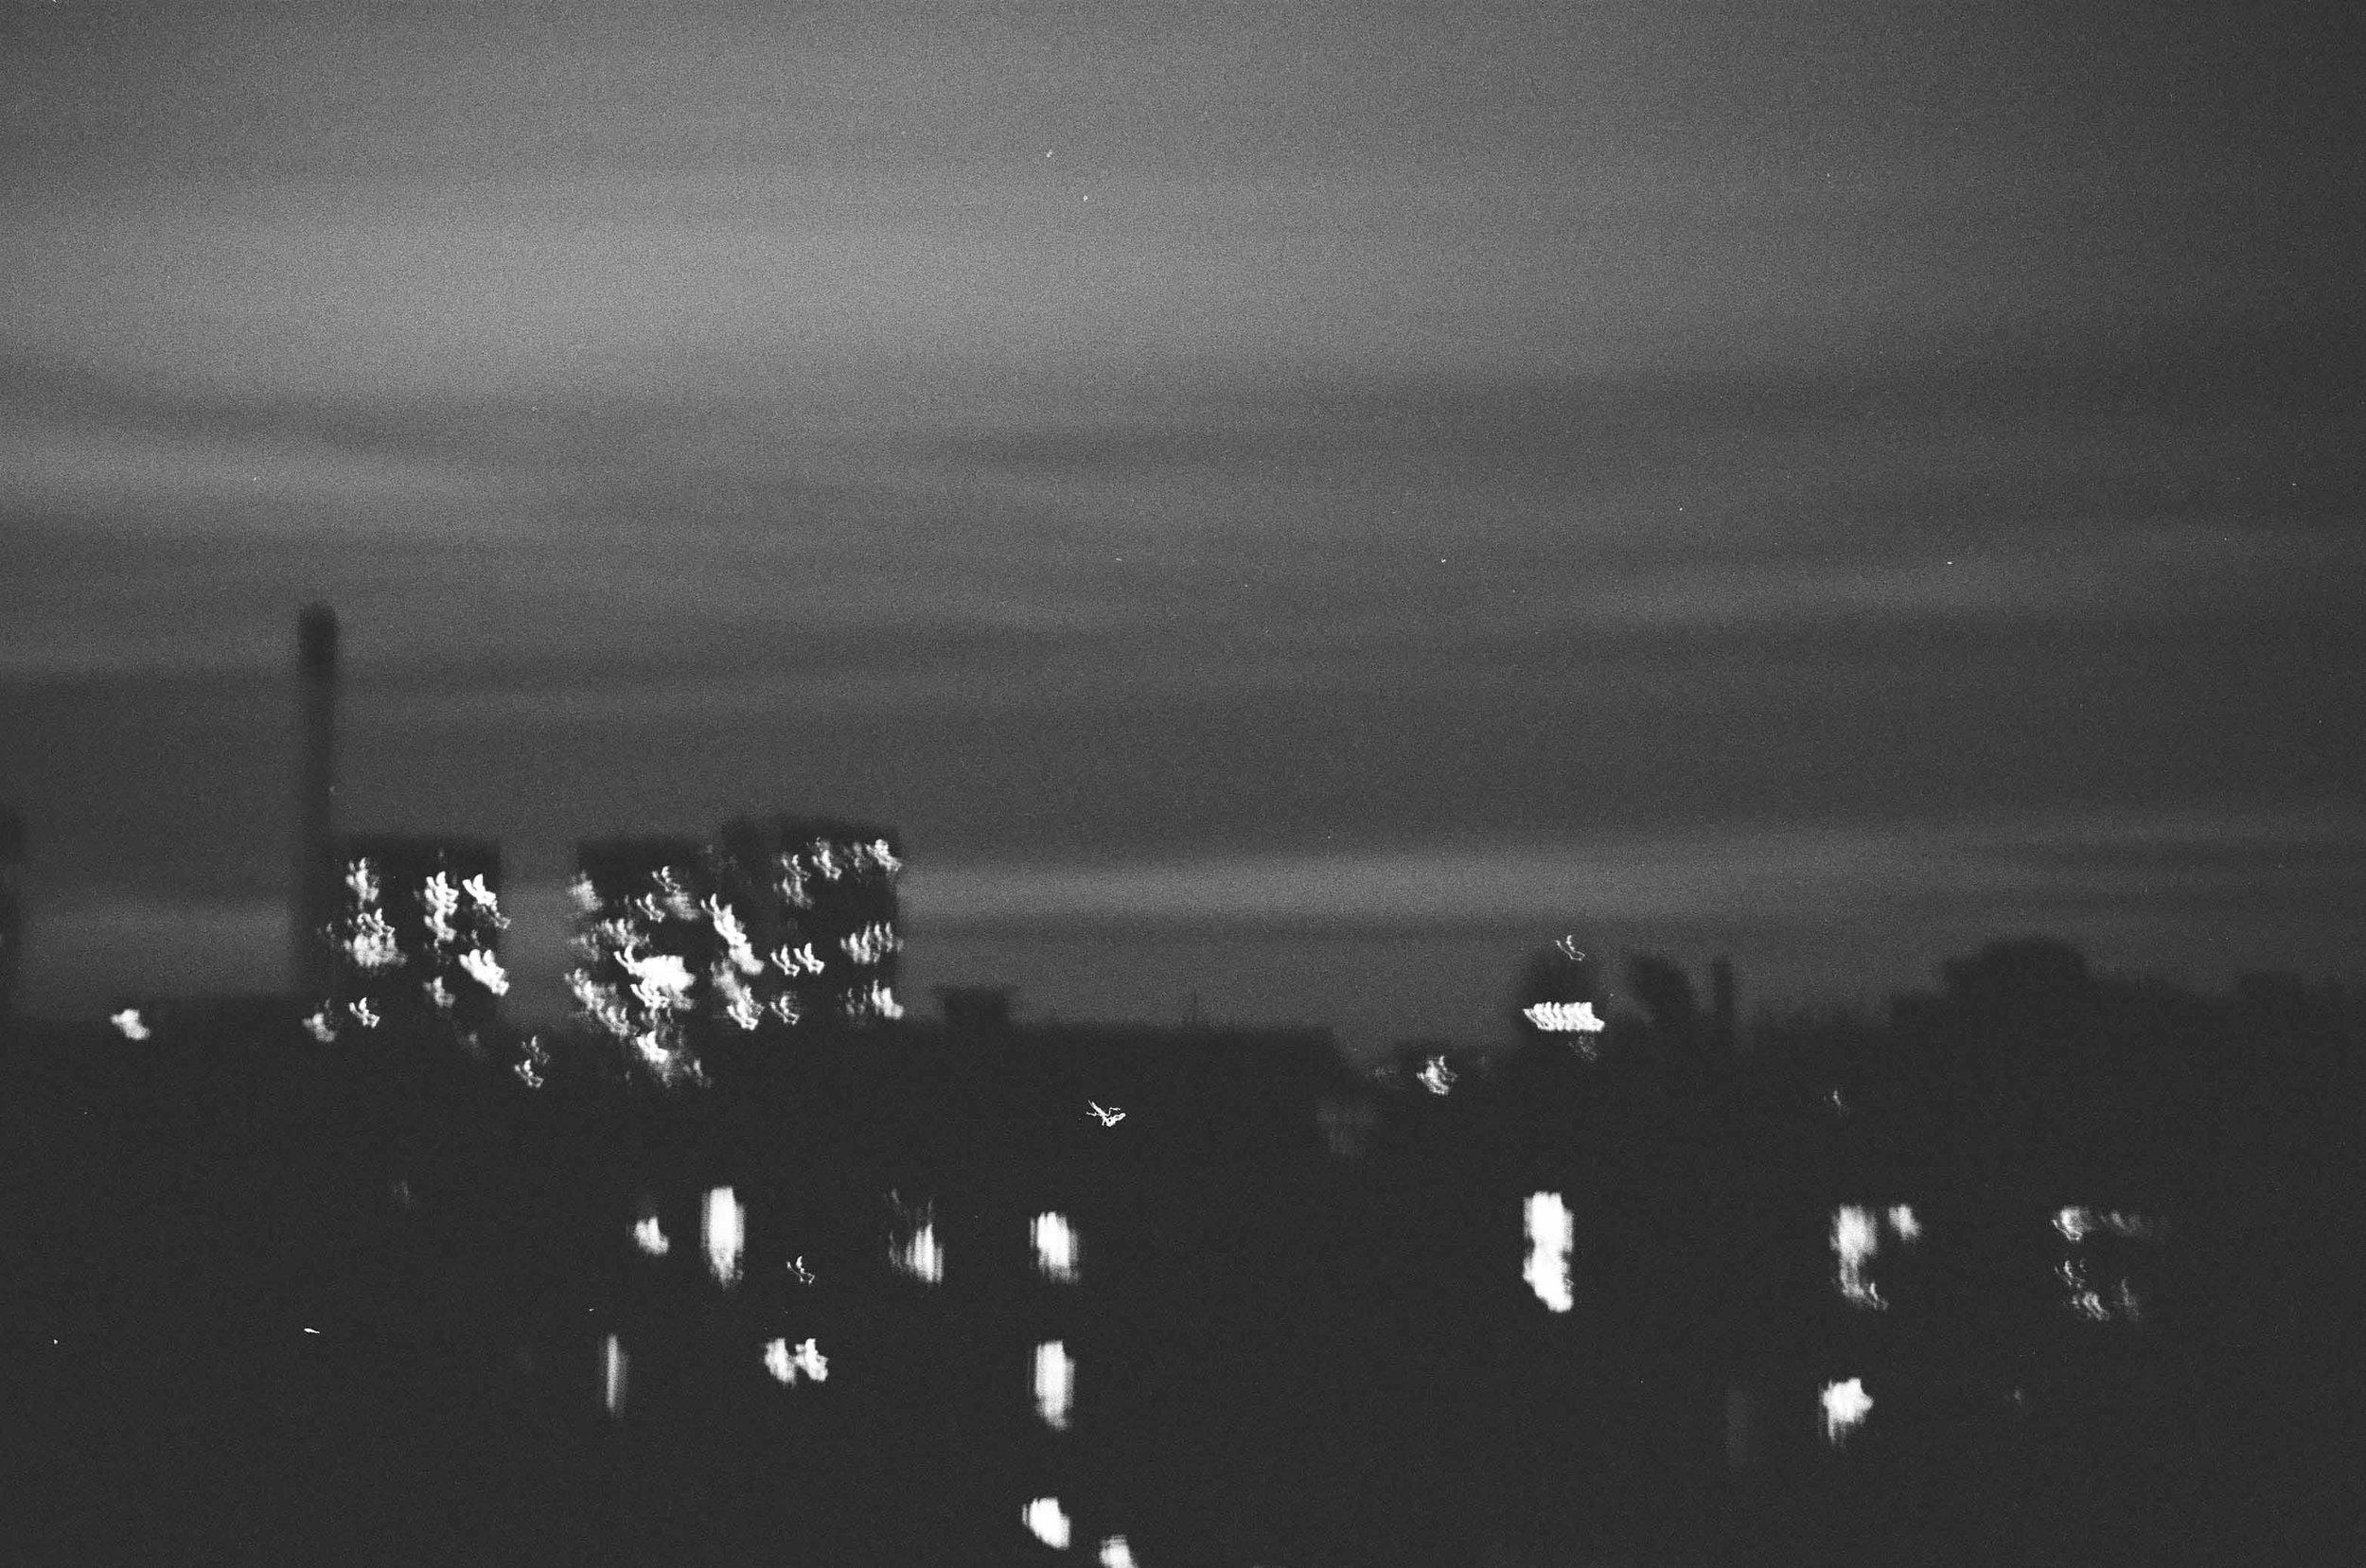 ChristosVourlis_photography_CVHAIR_CVDIARY_personal diary__film_35mm_0006_###.jpg